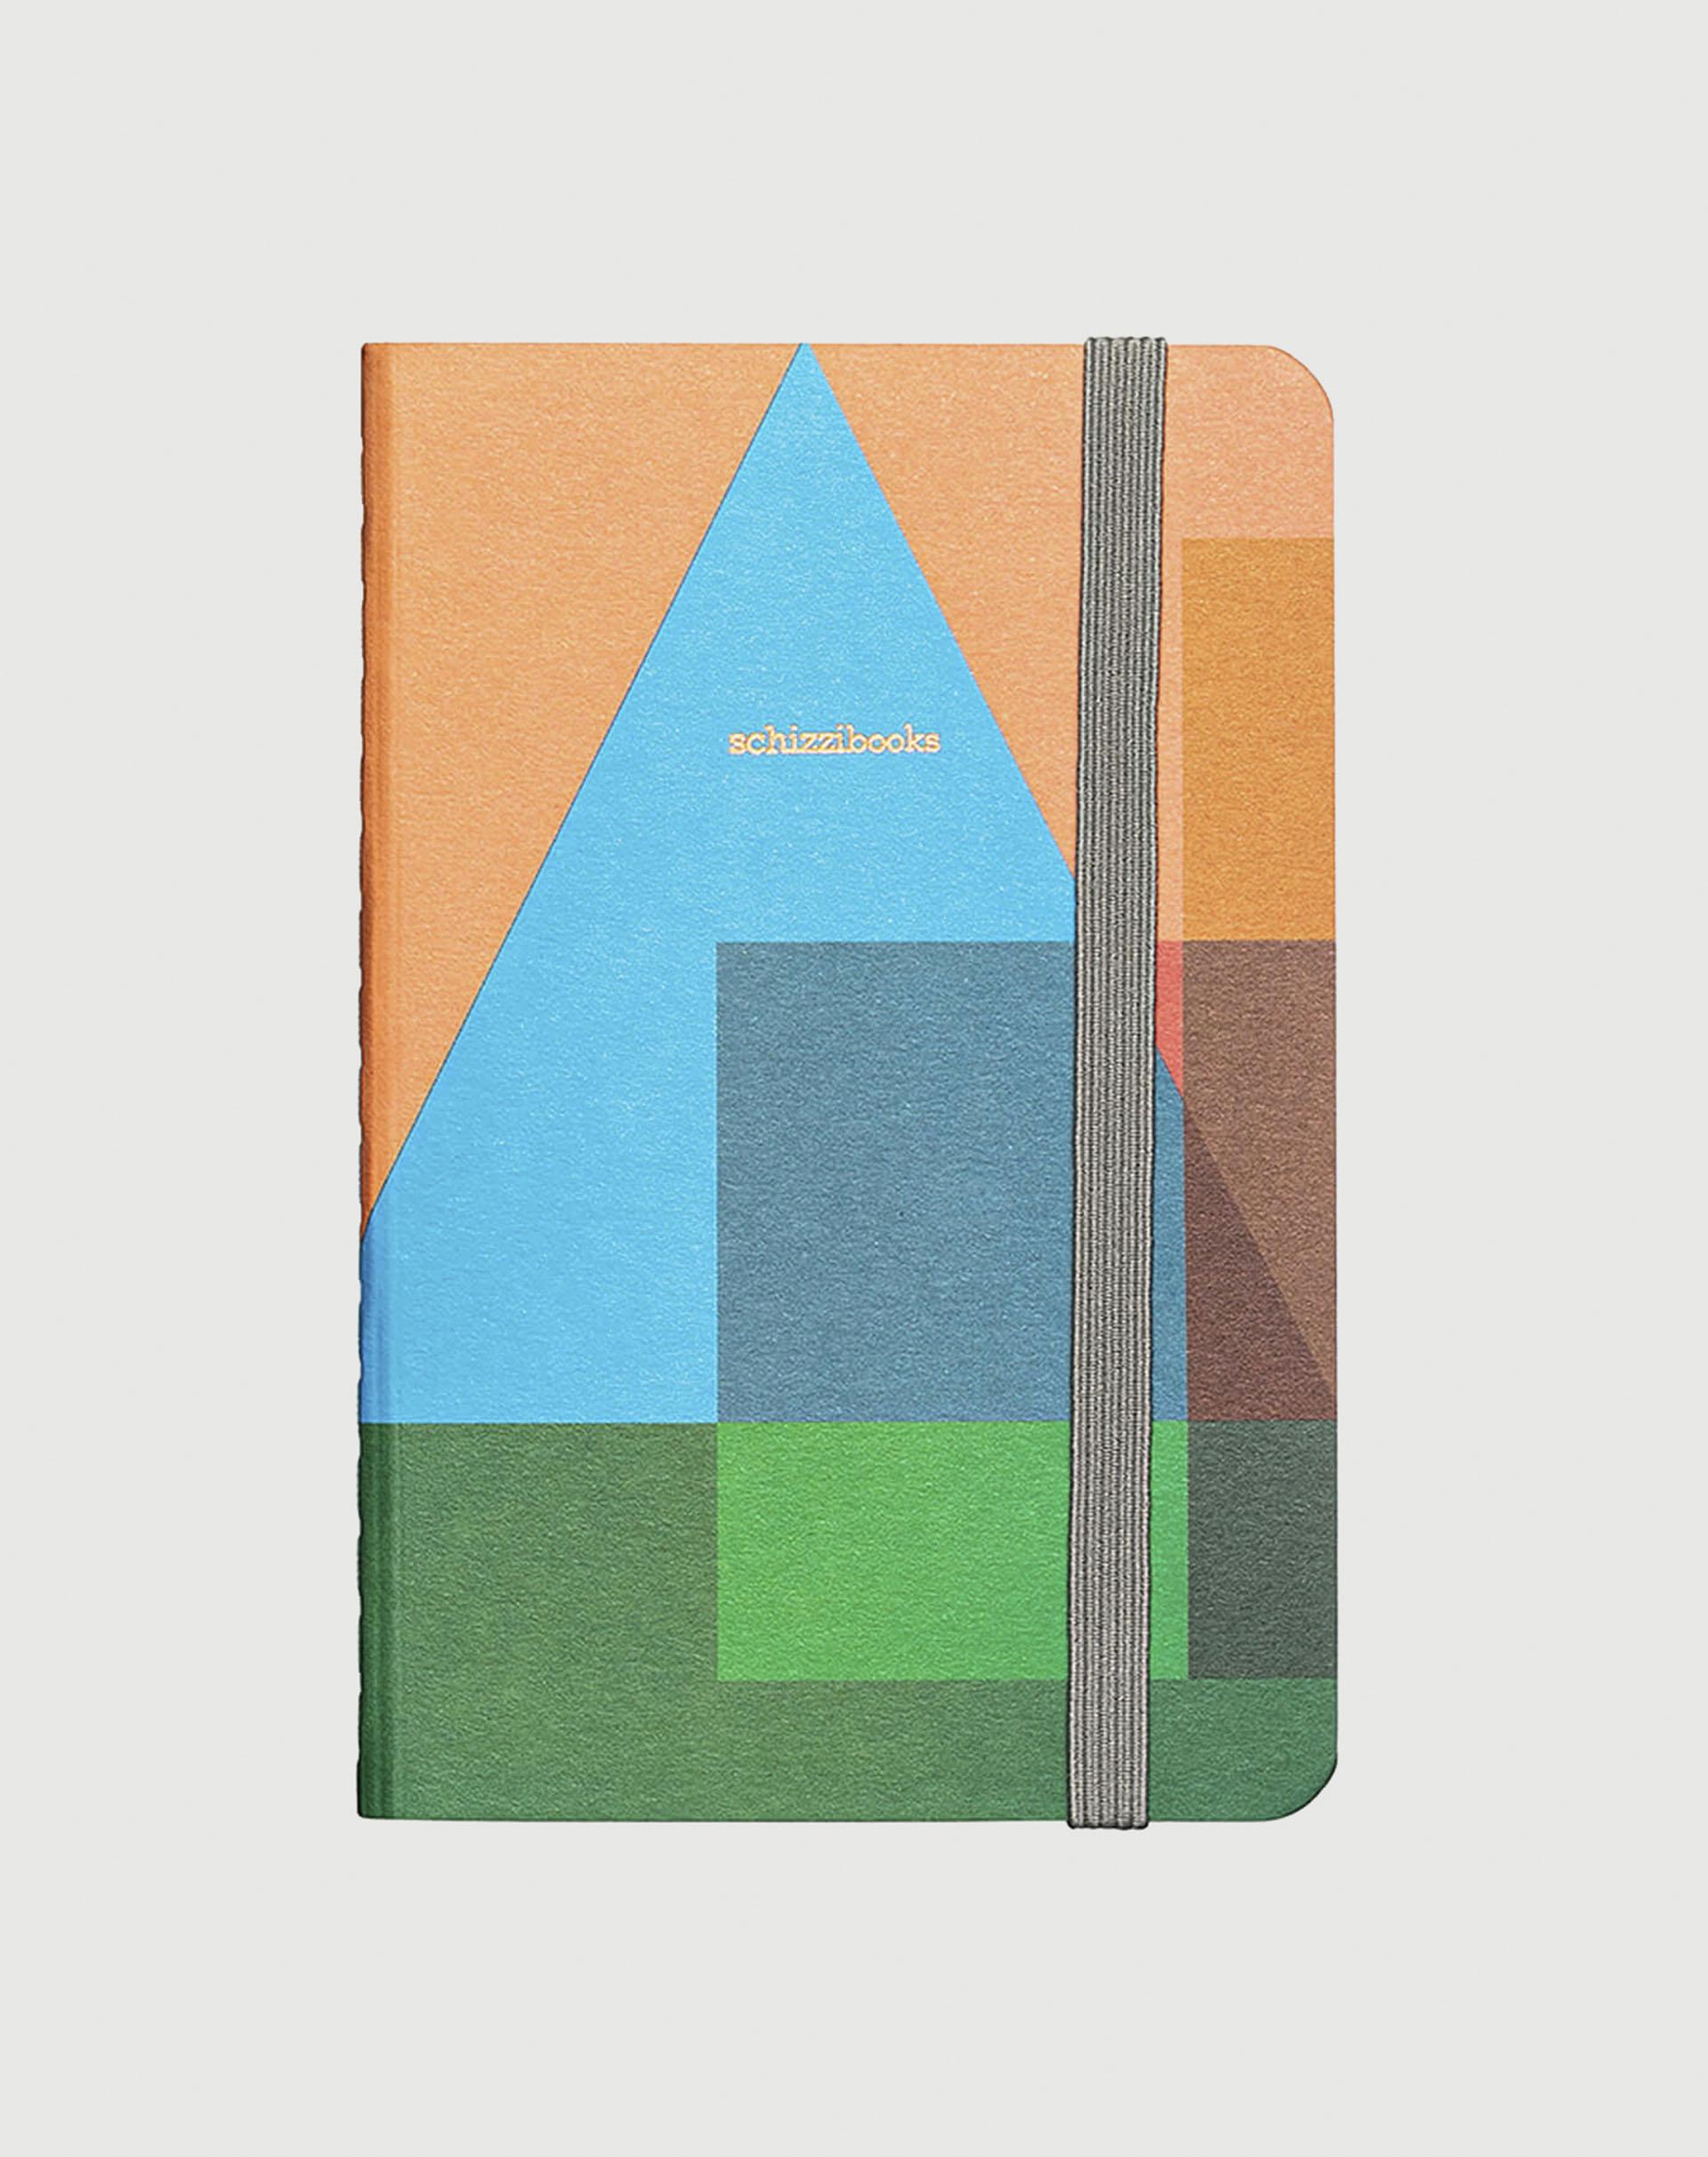 AMARO Feminino SCHIZZIBOOKS SKETCHBOOK POCKET, JANELA AZUL